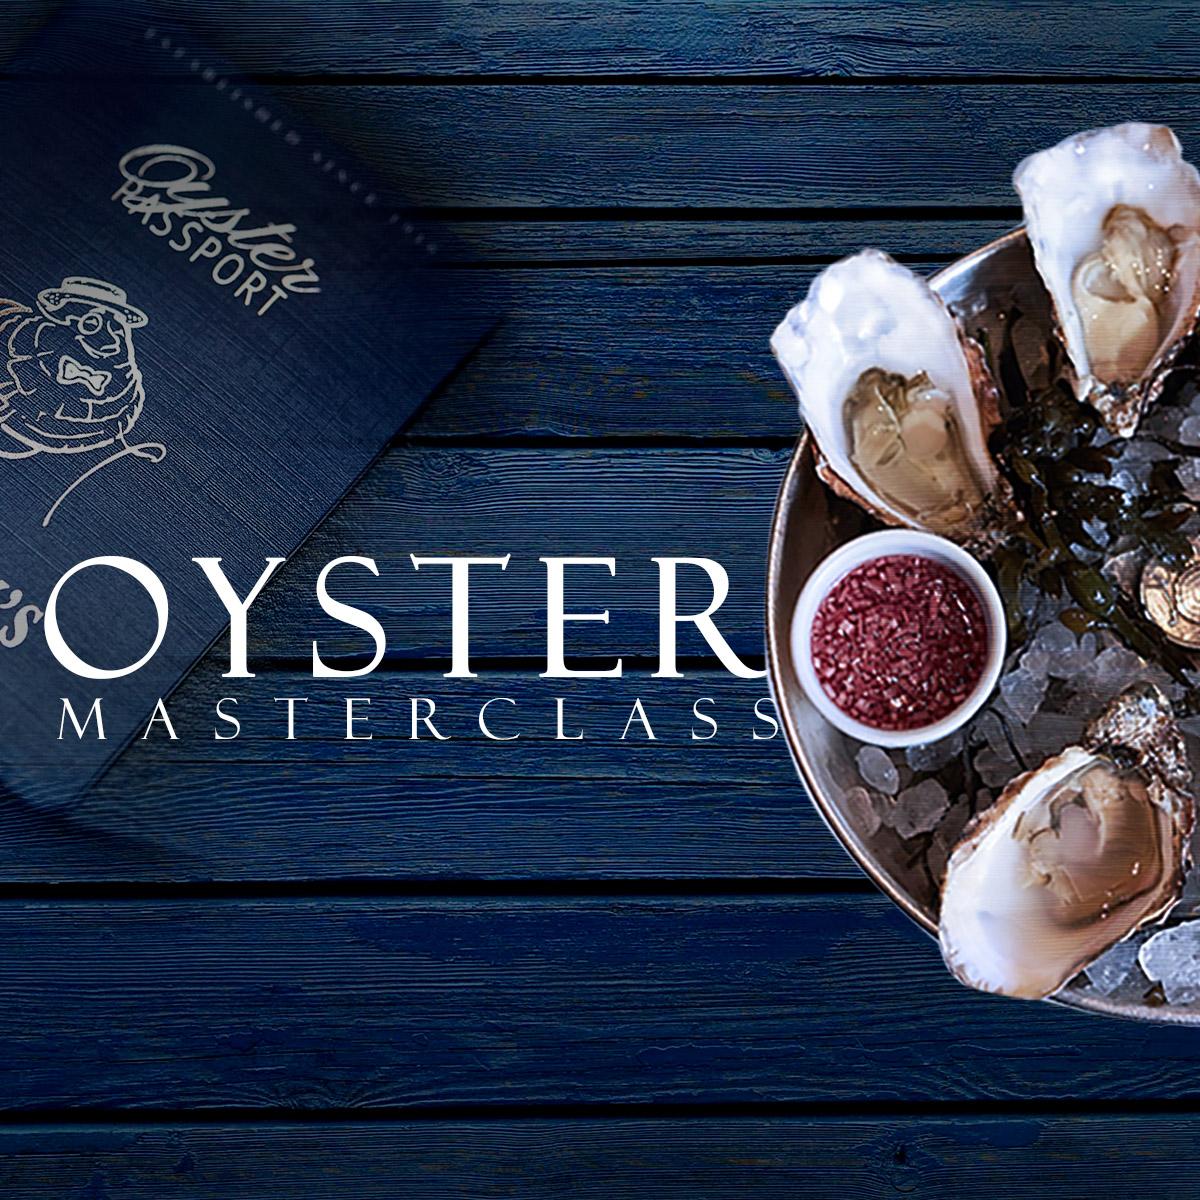 Oyster Masterclass